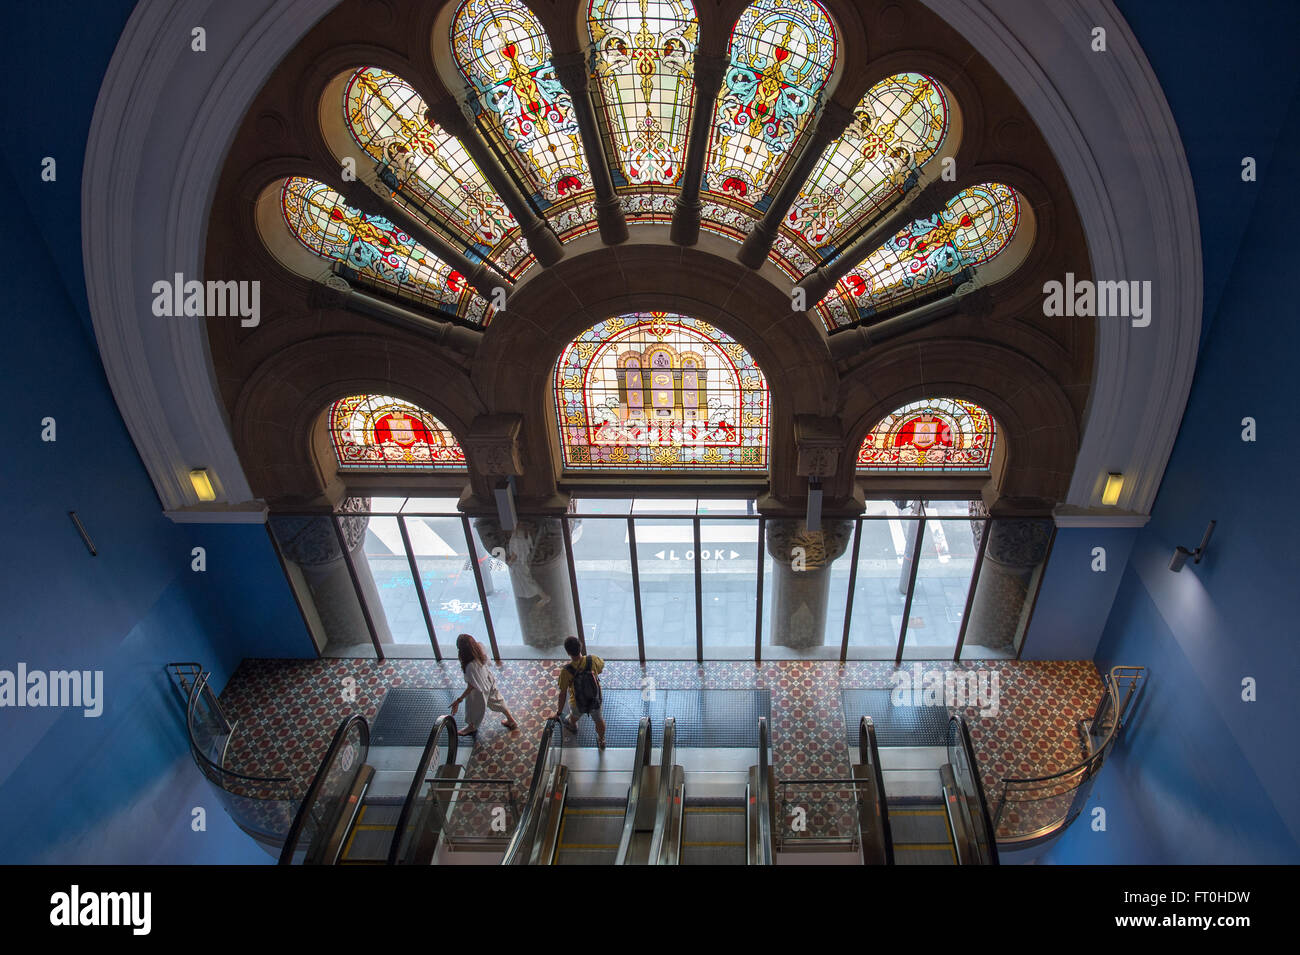 Queen Victoria Building, Sydney - Stock Image